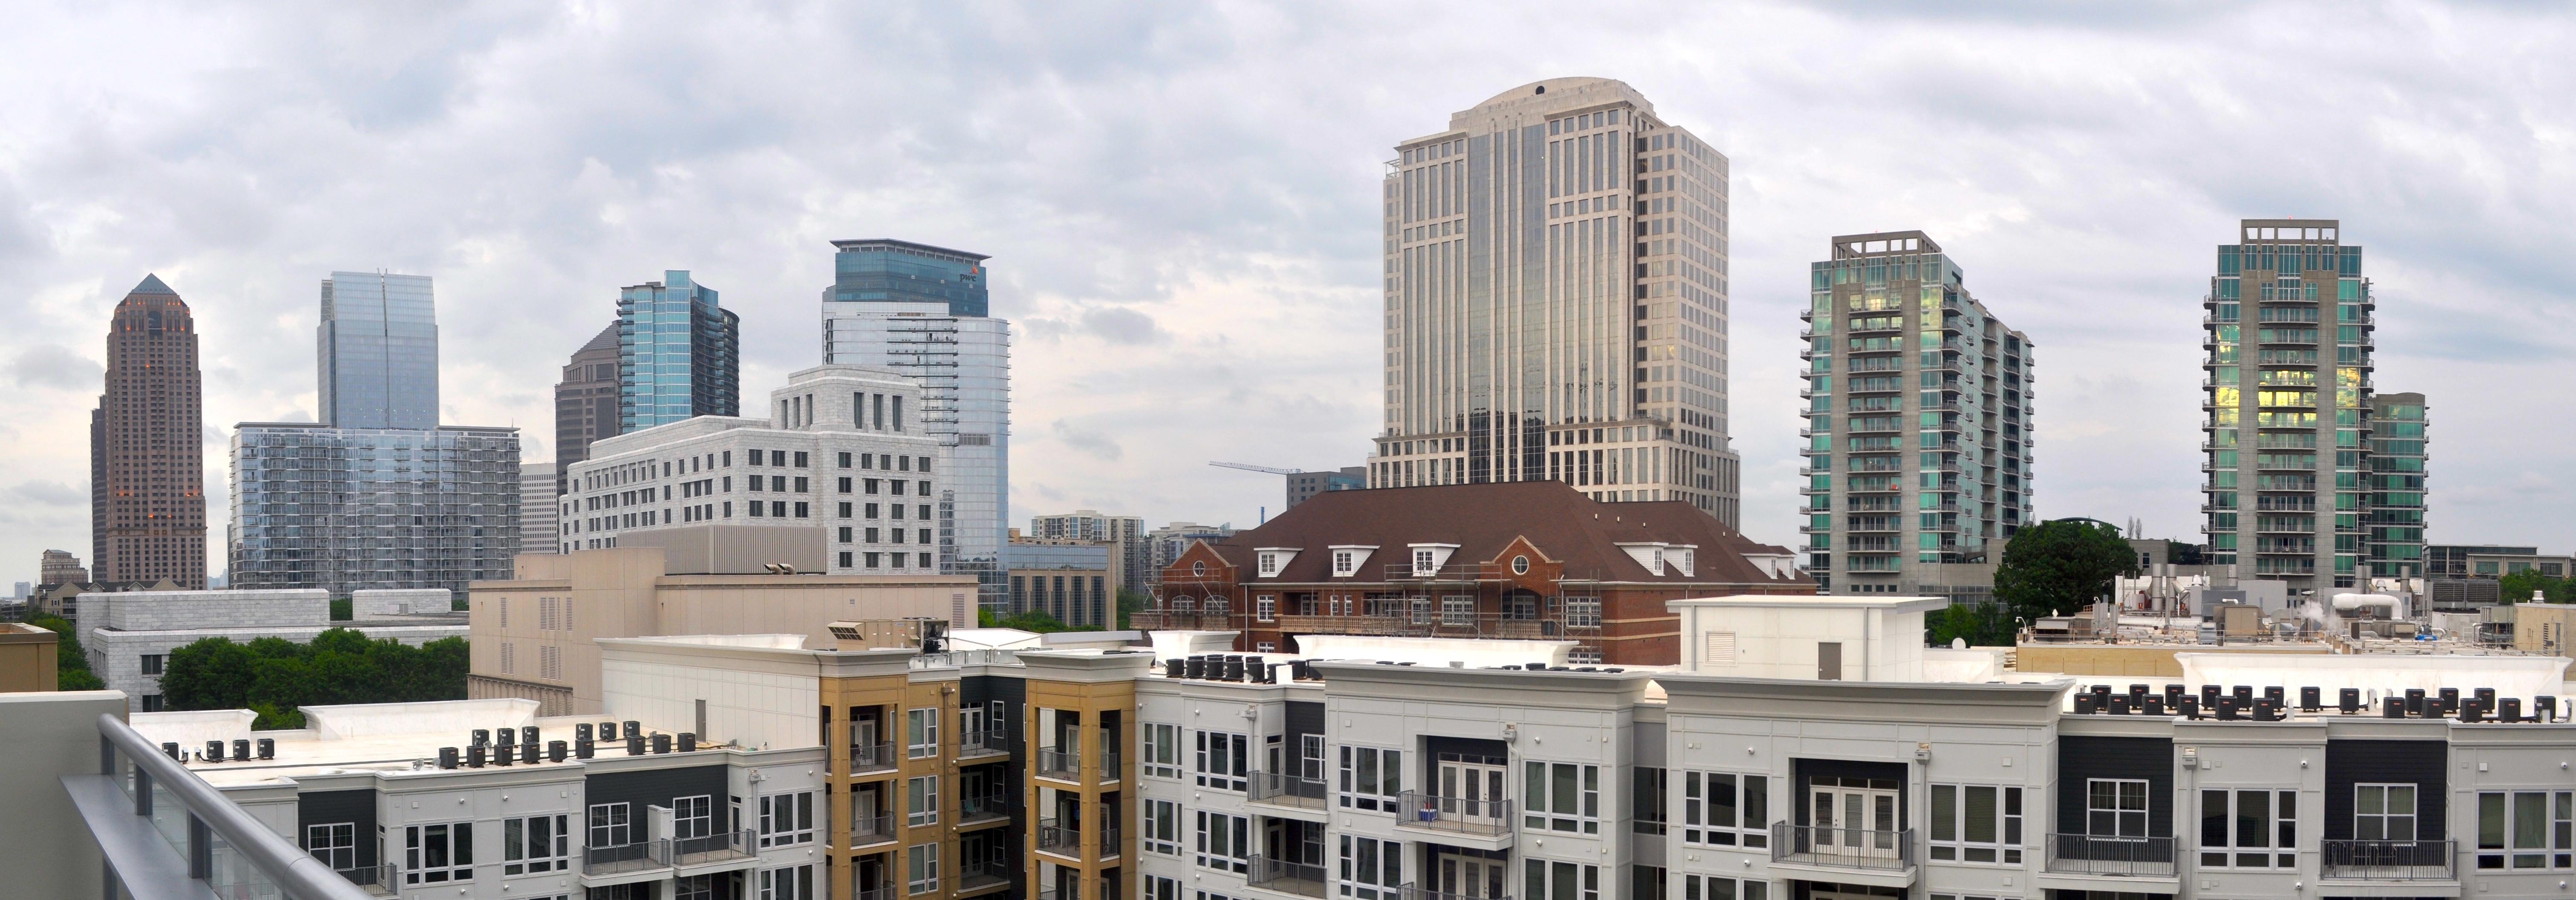 Atlanta applauded for taking steps toward greater affordability amid 'shortfall'